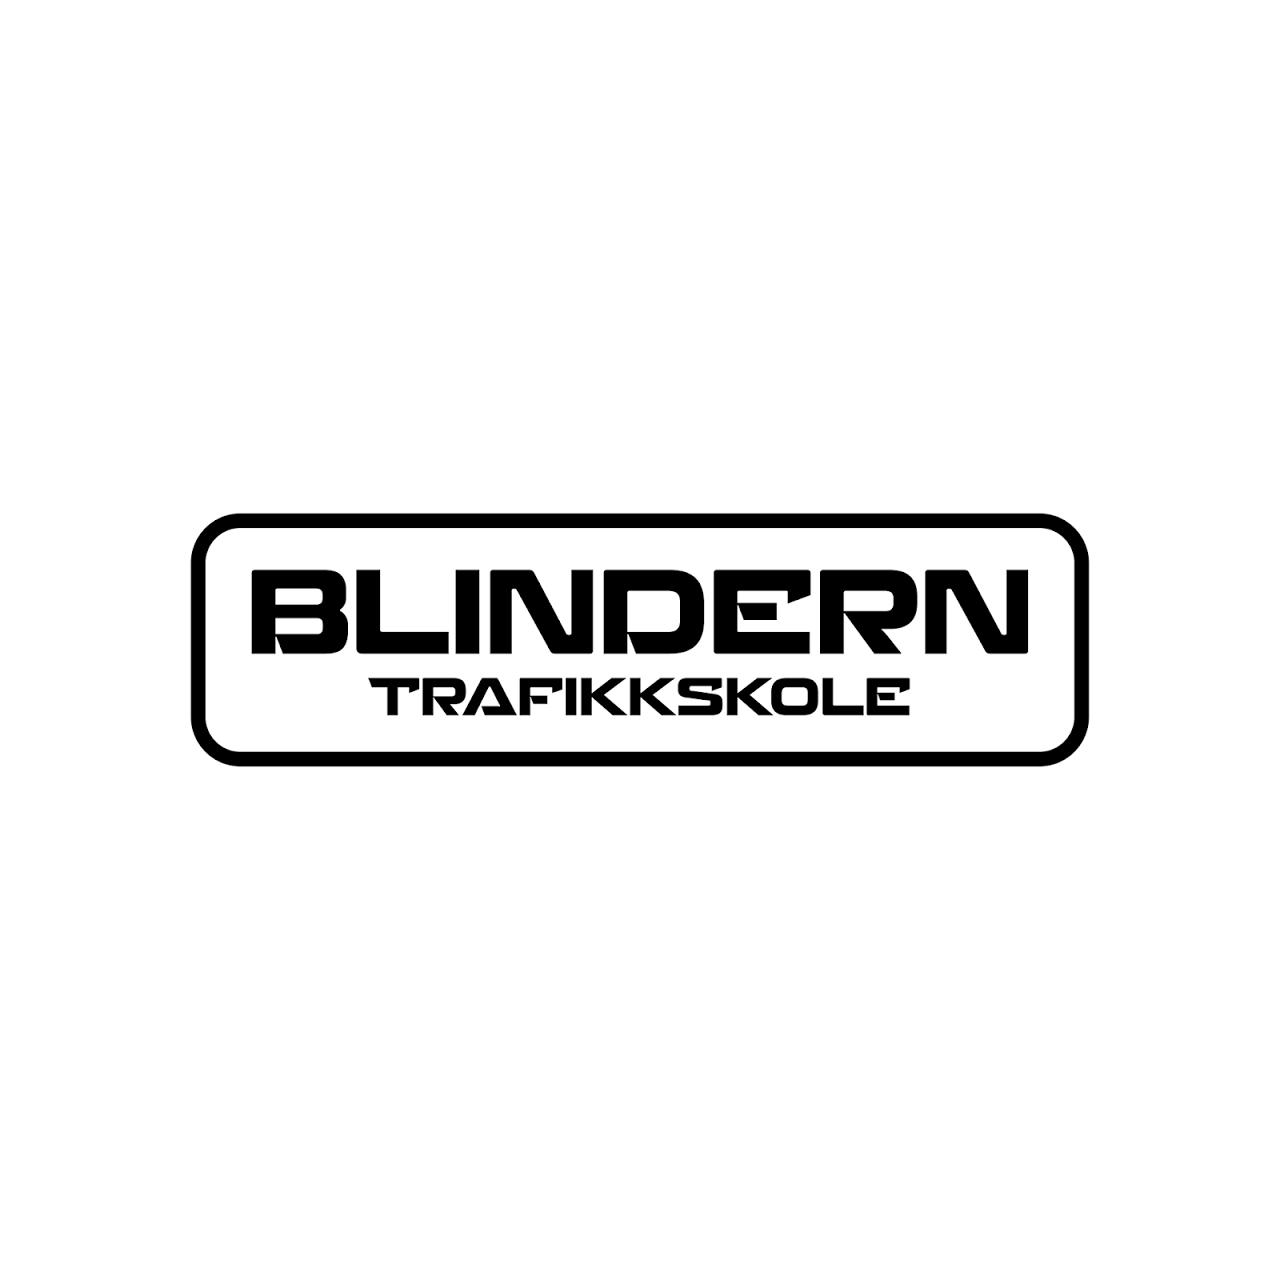 Blindern Trafikkskole